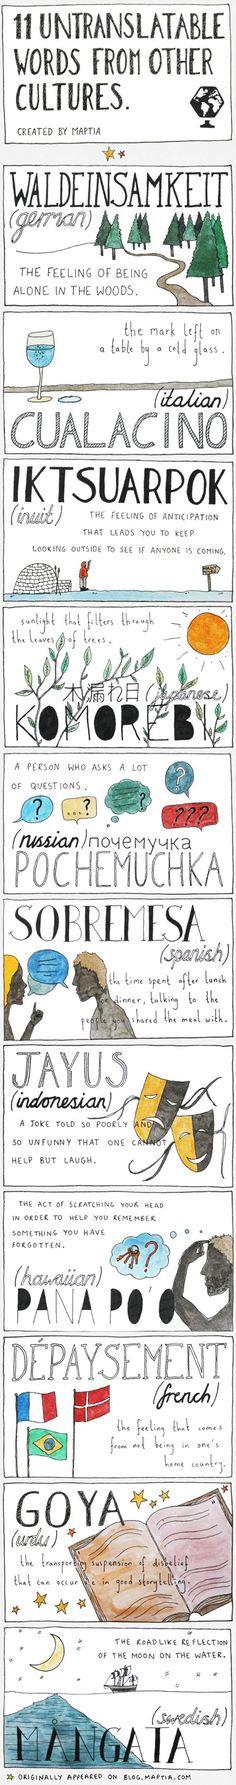 11 Untranslatable Words...